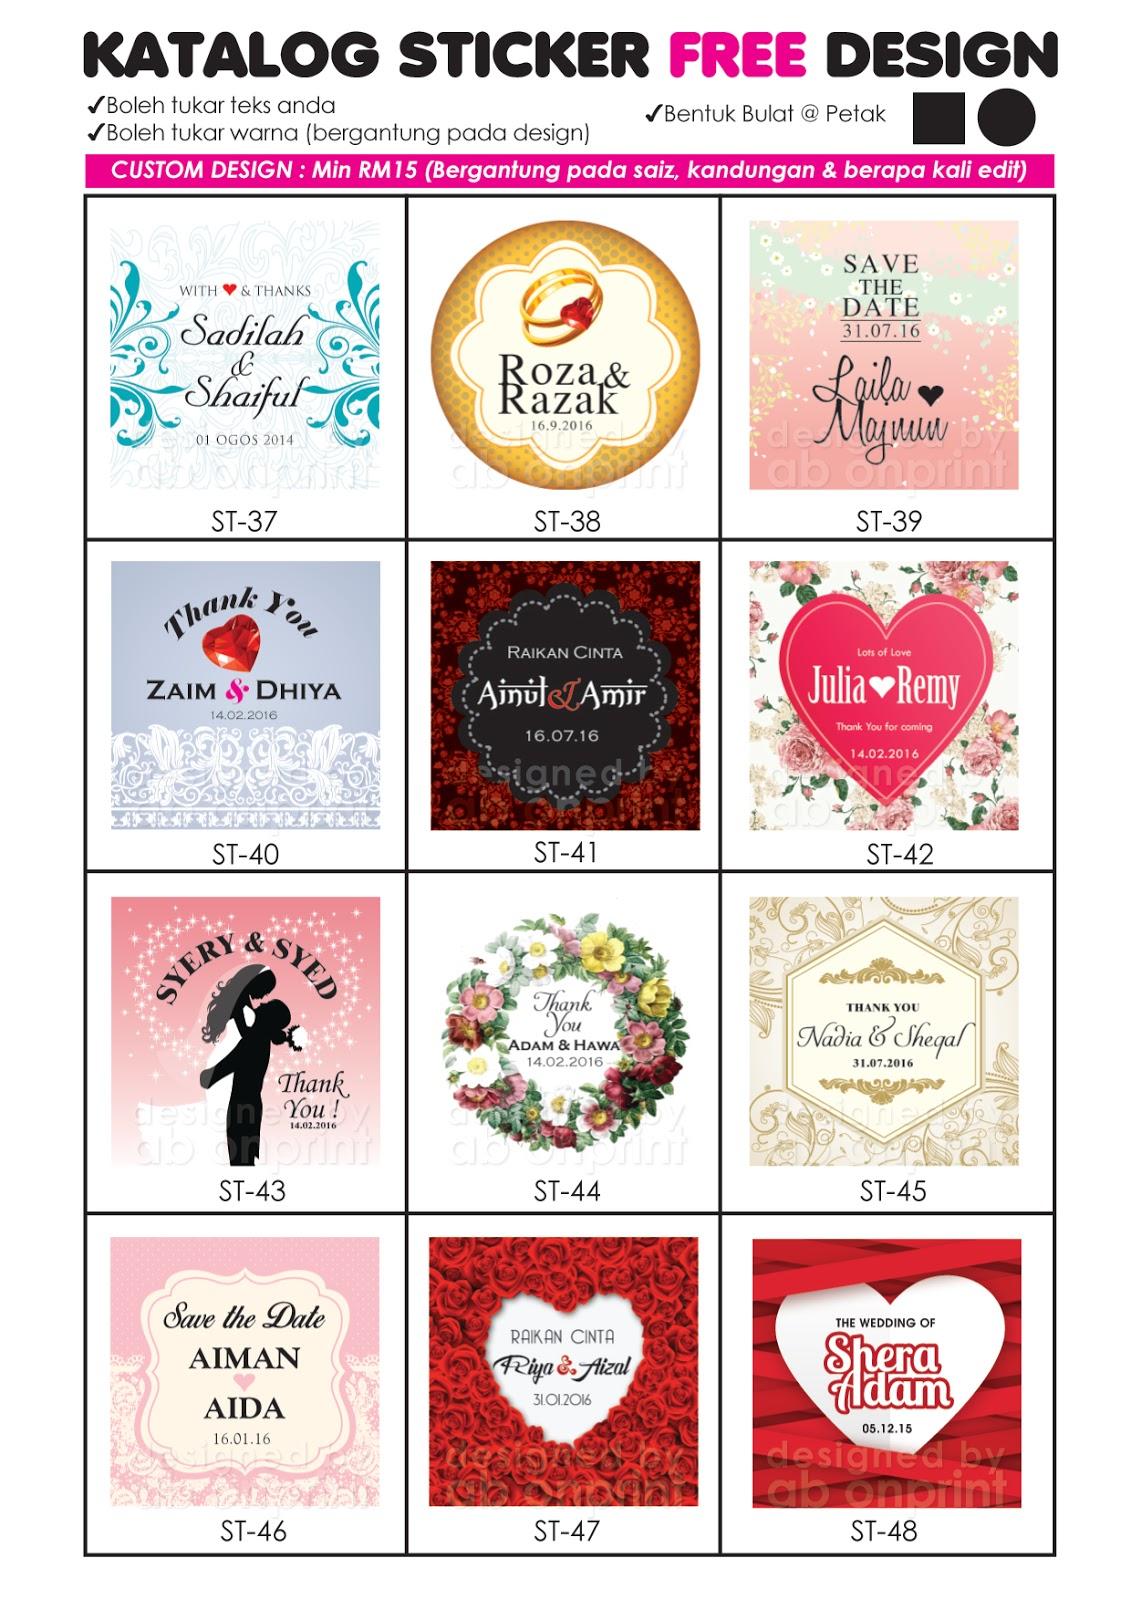 Ab onprint design print katalog design sticker for Design katalog